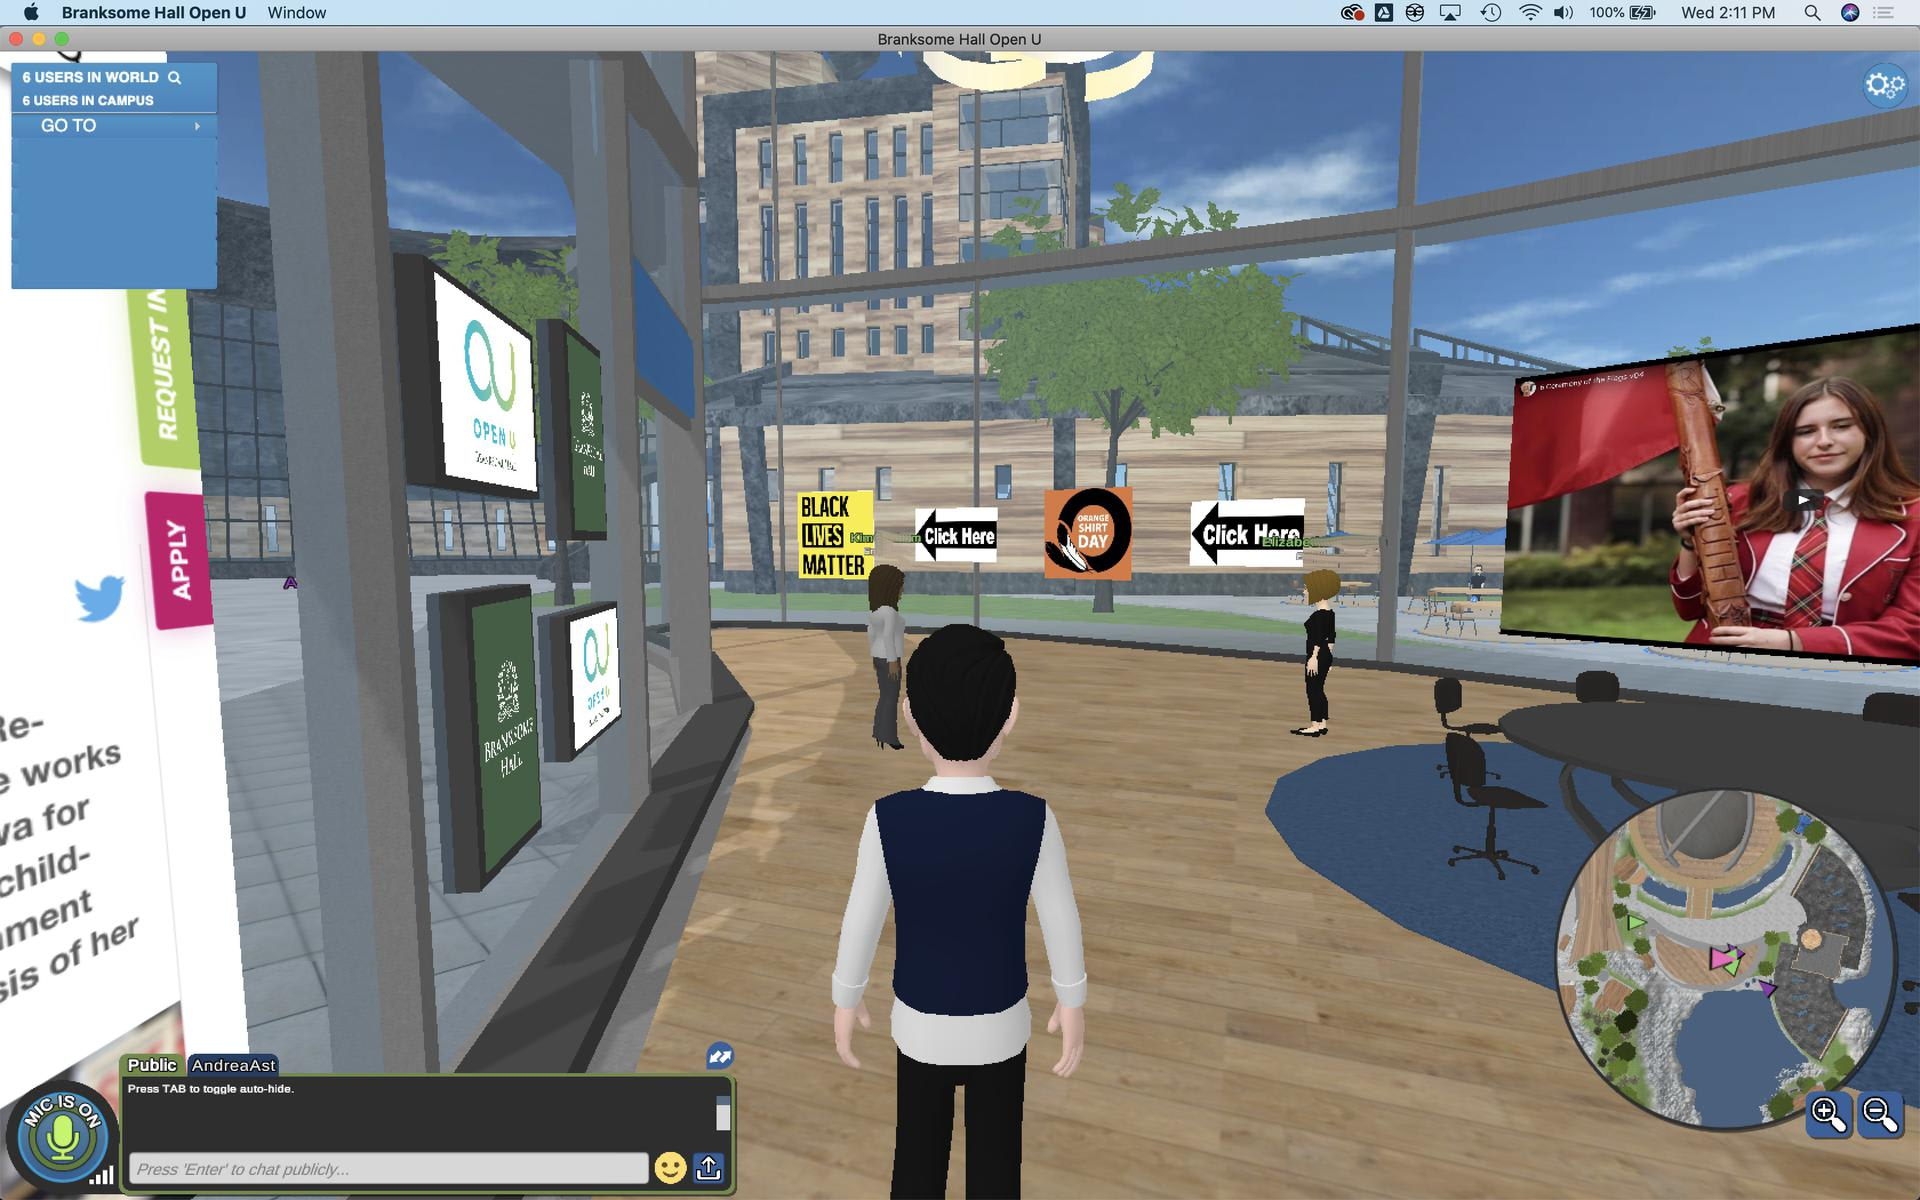 Branksome Hall: First-ever Virtual Clubs Fair